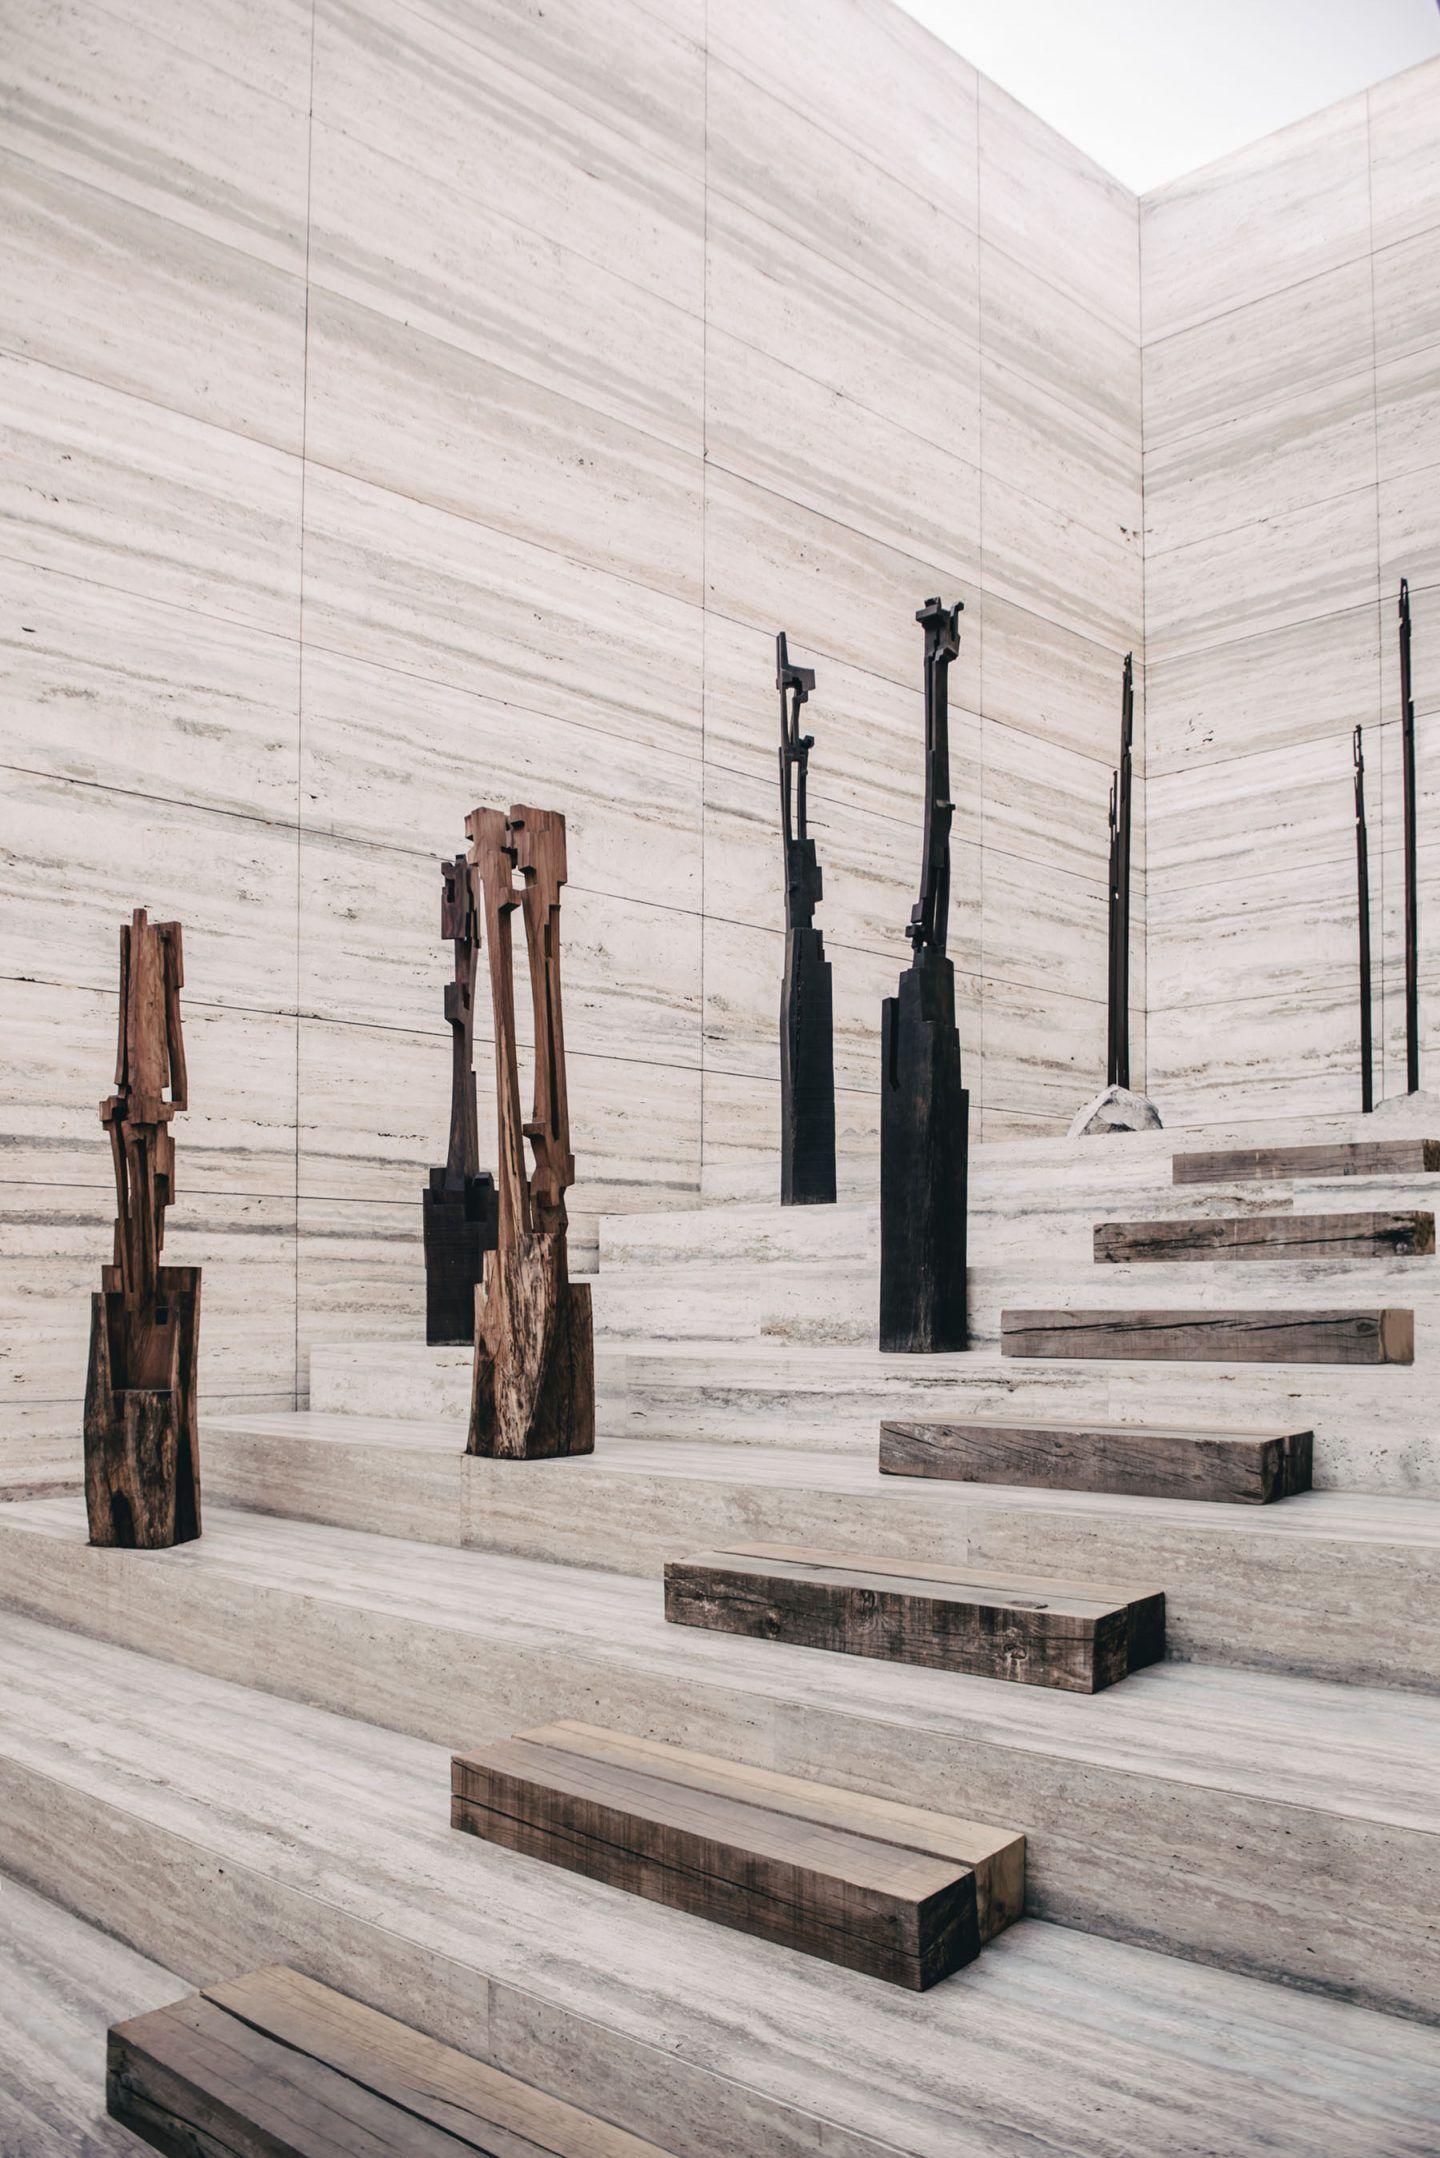 IGNANT-Travel-Esrawe-Studio-Arca-Store-Genevieve-Lutkin-3